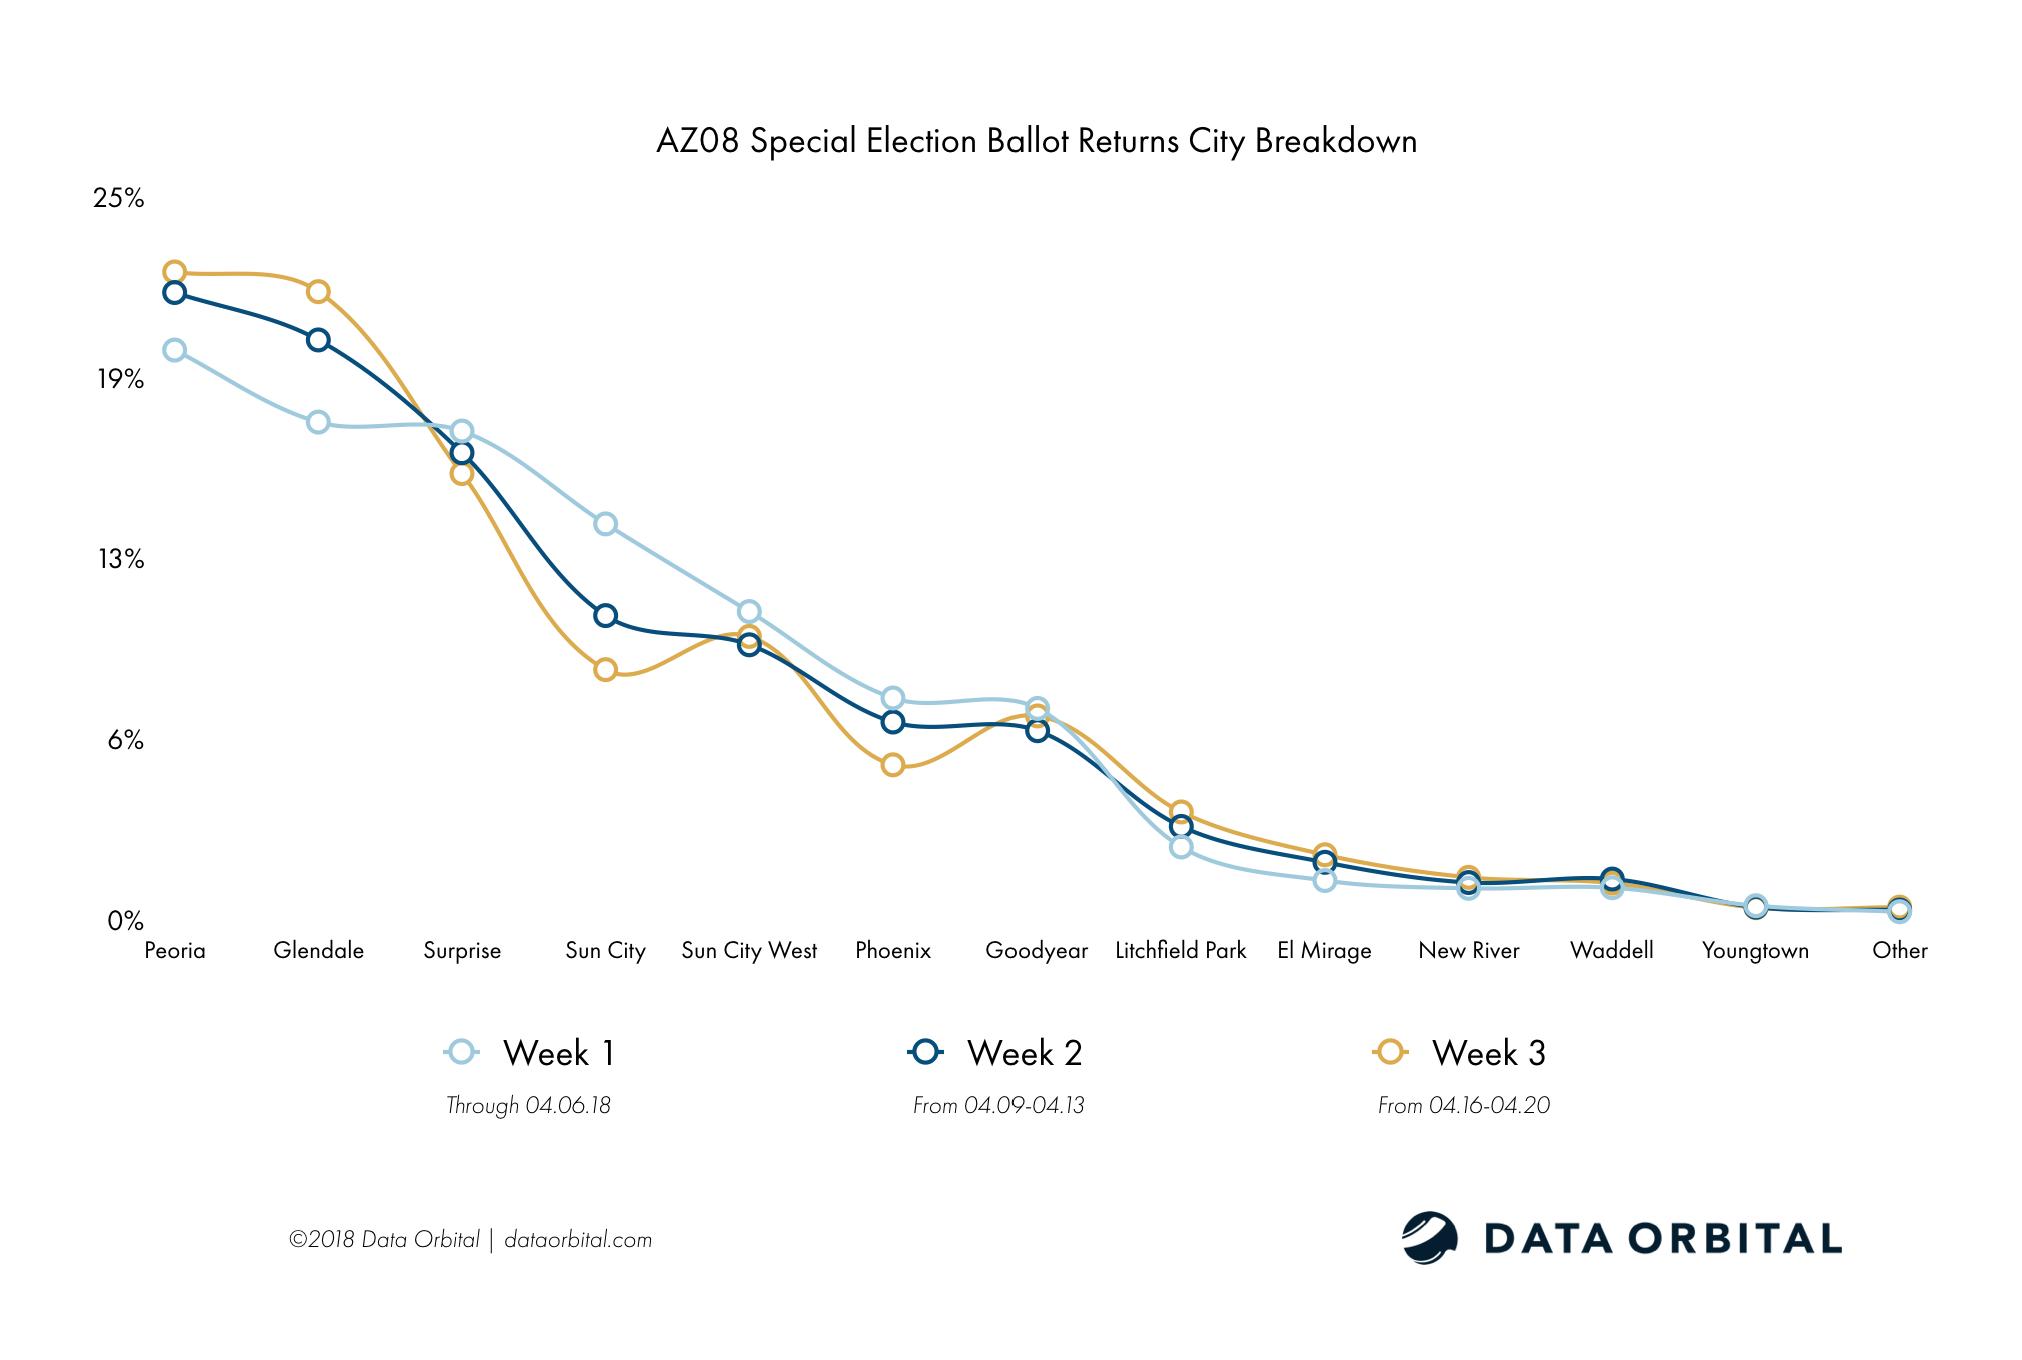 AZ08 Special Election Ballot Returns Week 3 Wrap Up and Analysis City